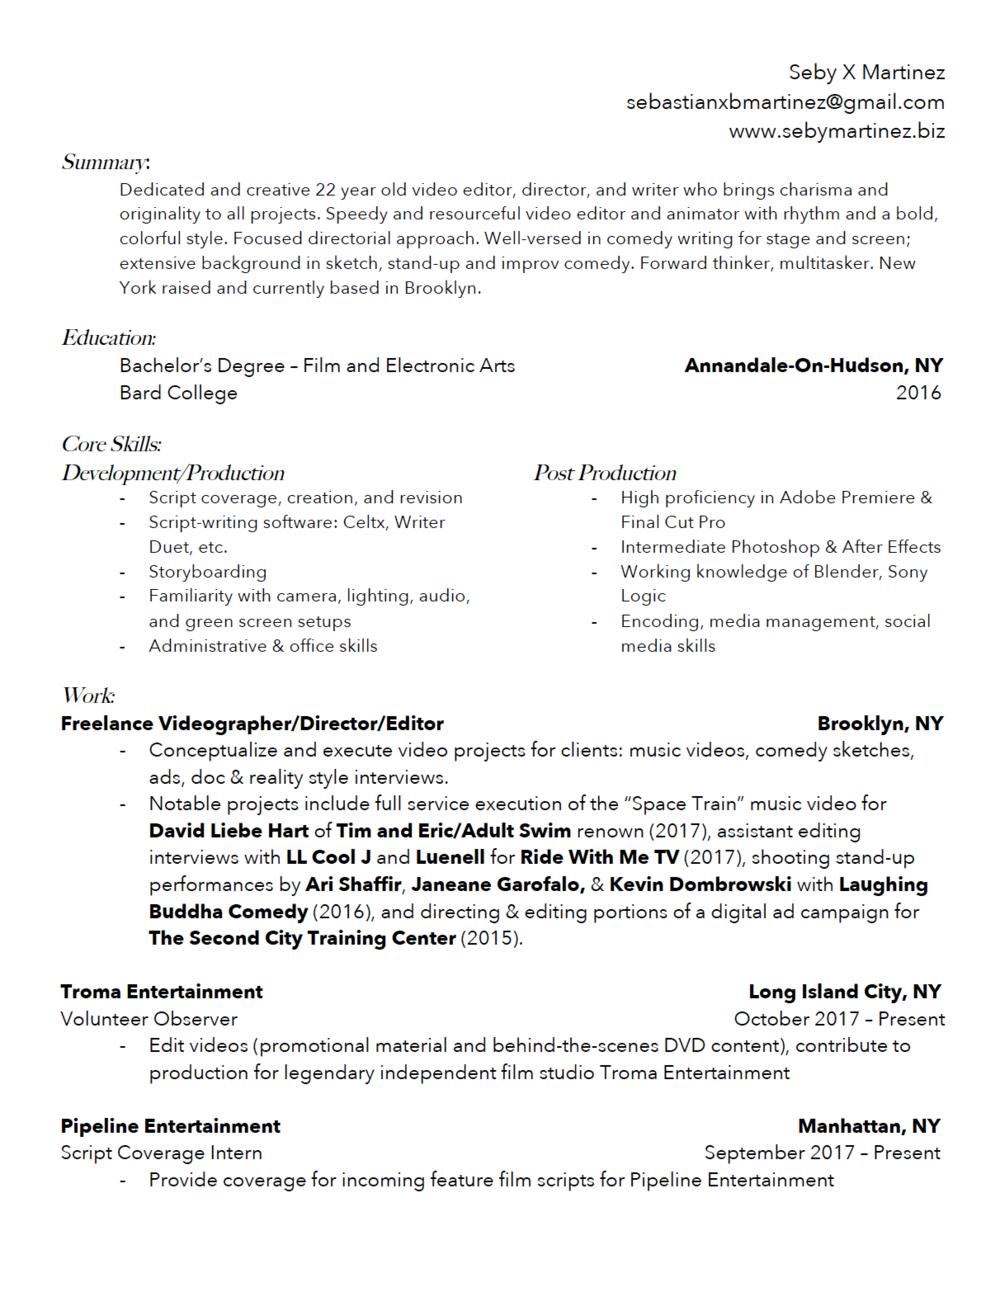 resume contact seby martinez video editor digital artist